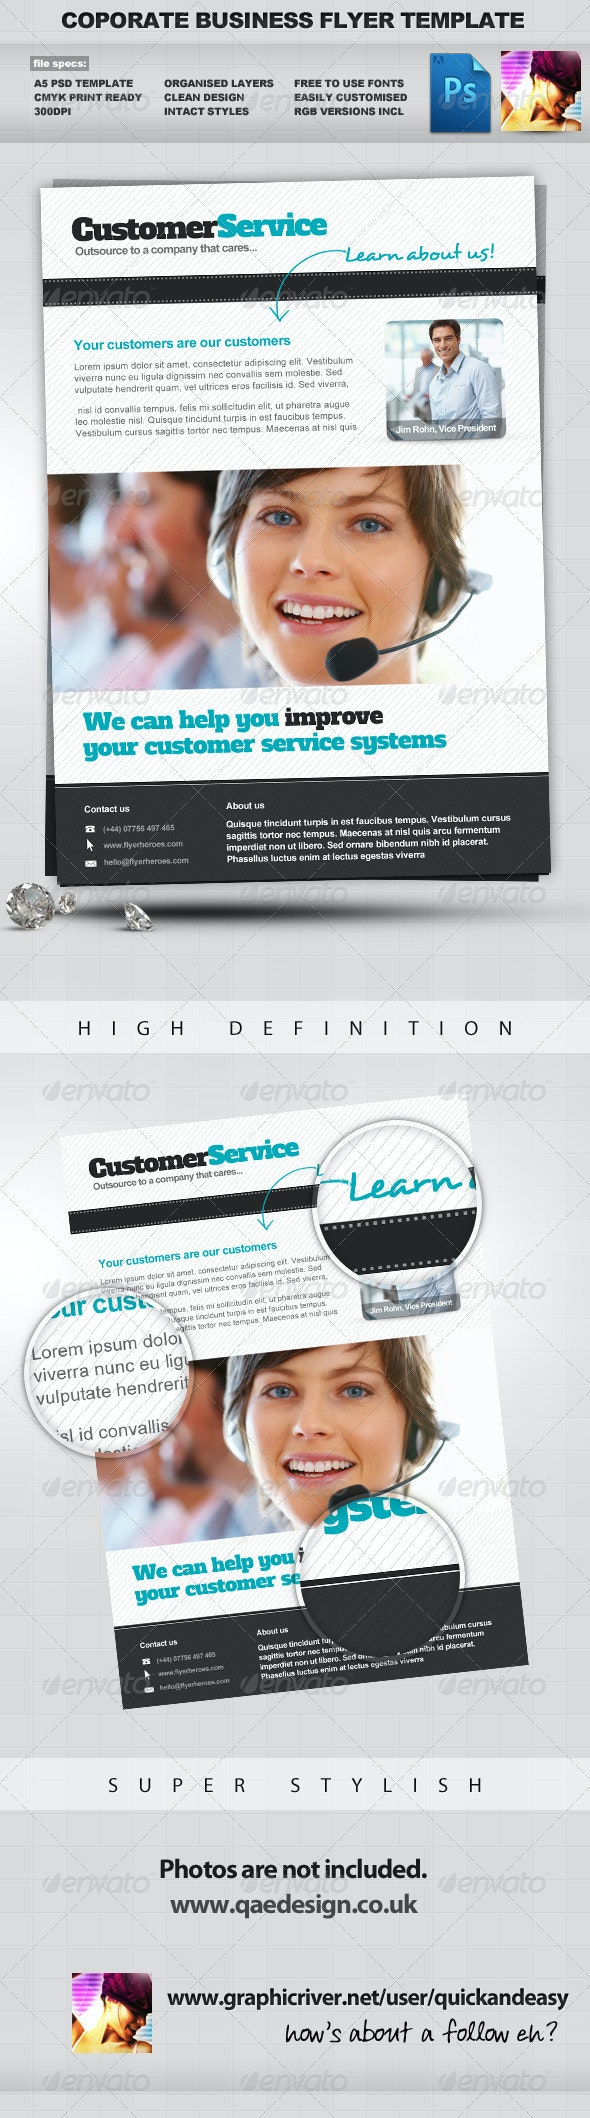 Corporate / Business PSD Flyer Template Vol. 2 - Corporate Flyers